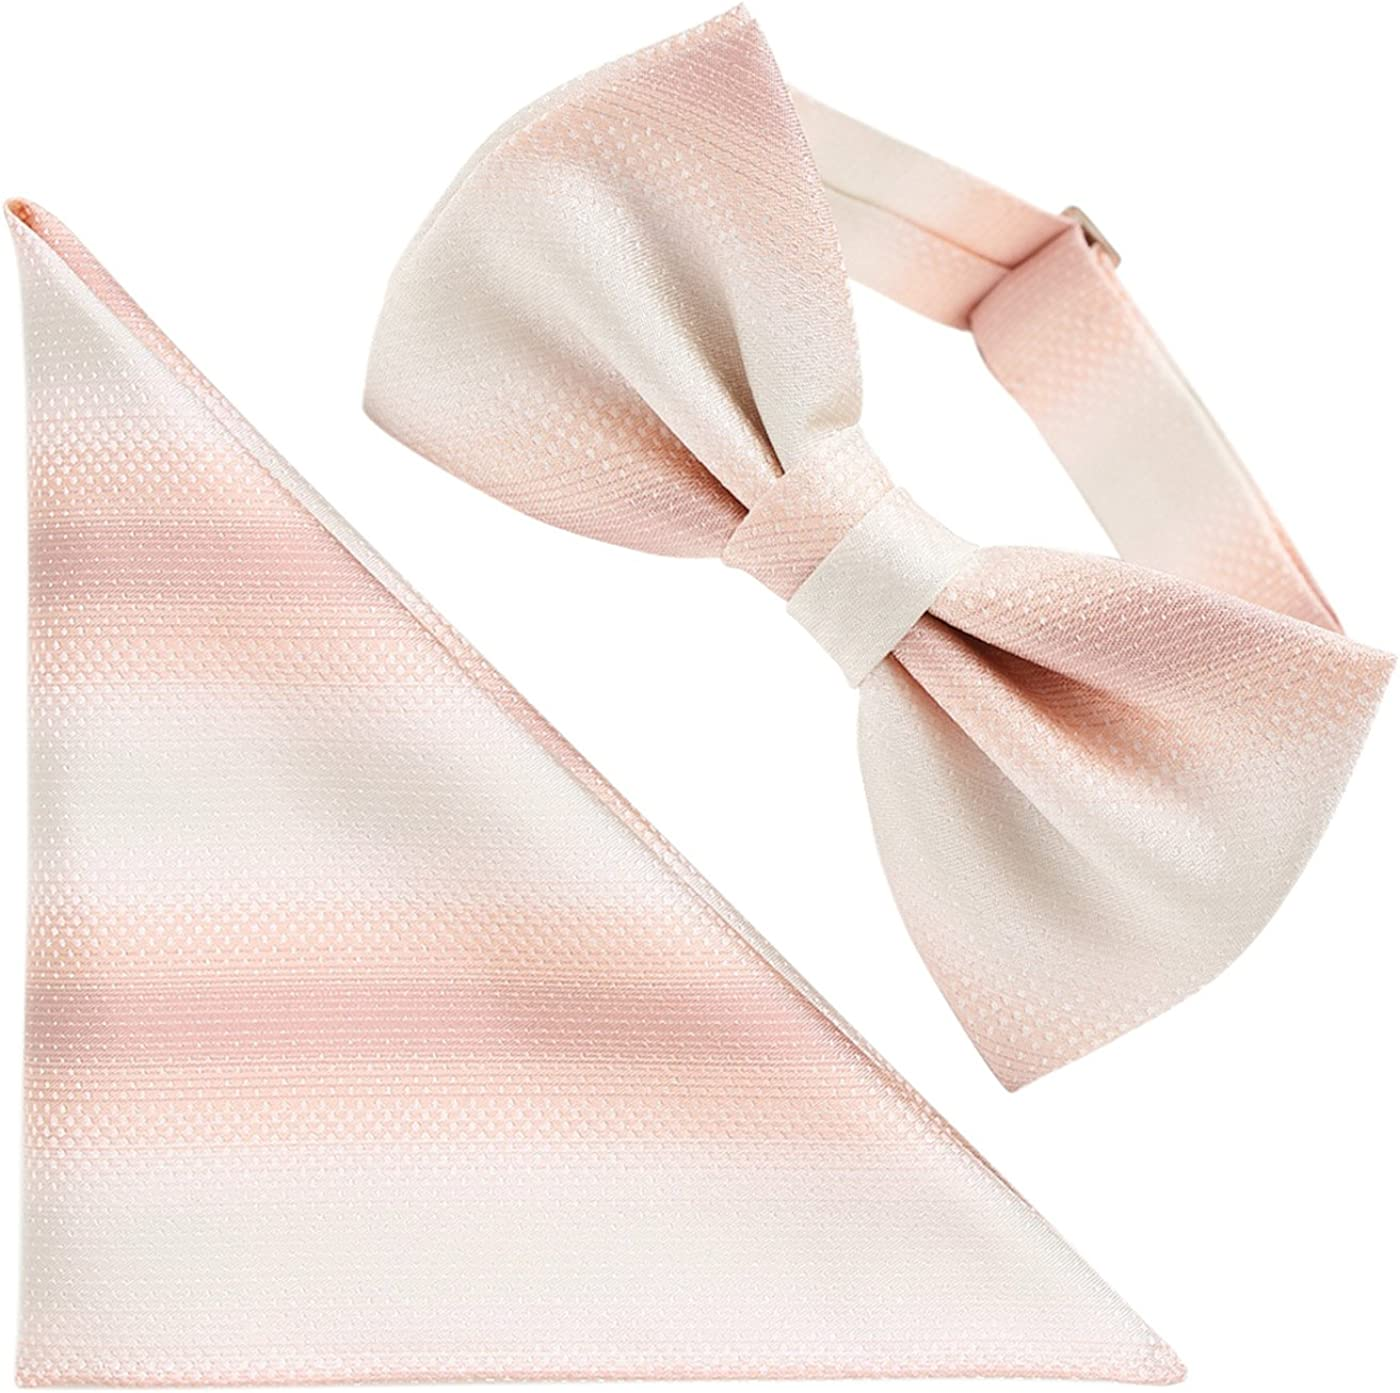 FORTUNA Tokyo Men's Pre-Tied Adjustable Butterfly Bow Tie & Pocket Square Set 100% Silk -12. Horizon- Gradation Pattern Made in Japan